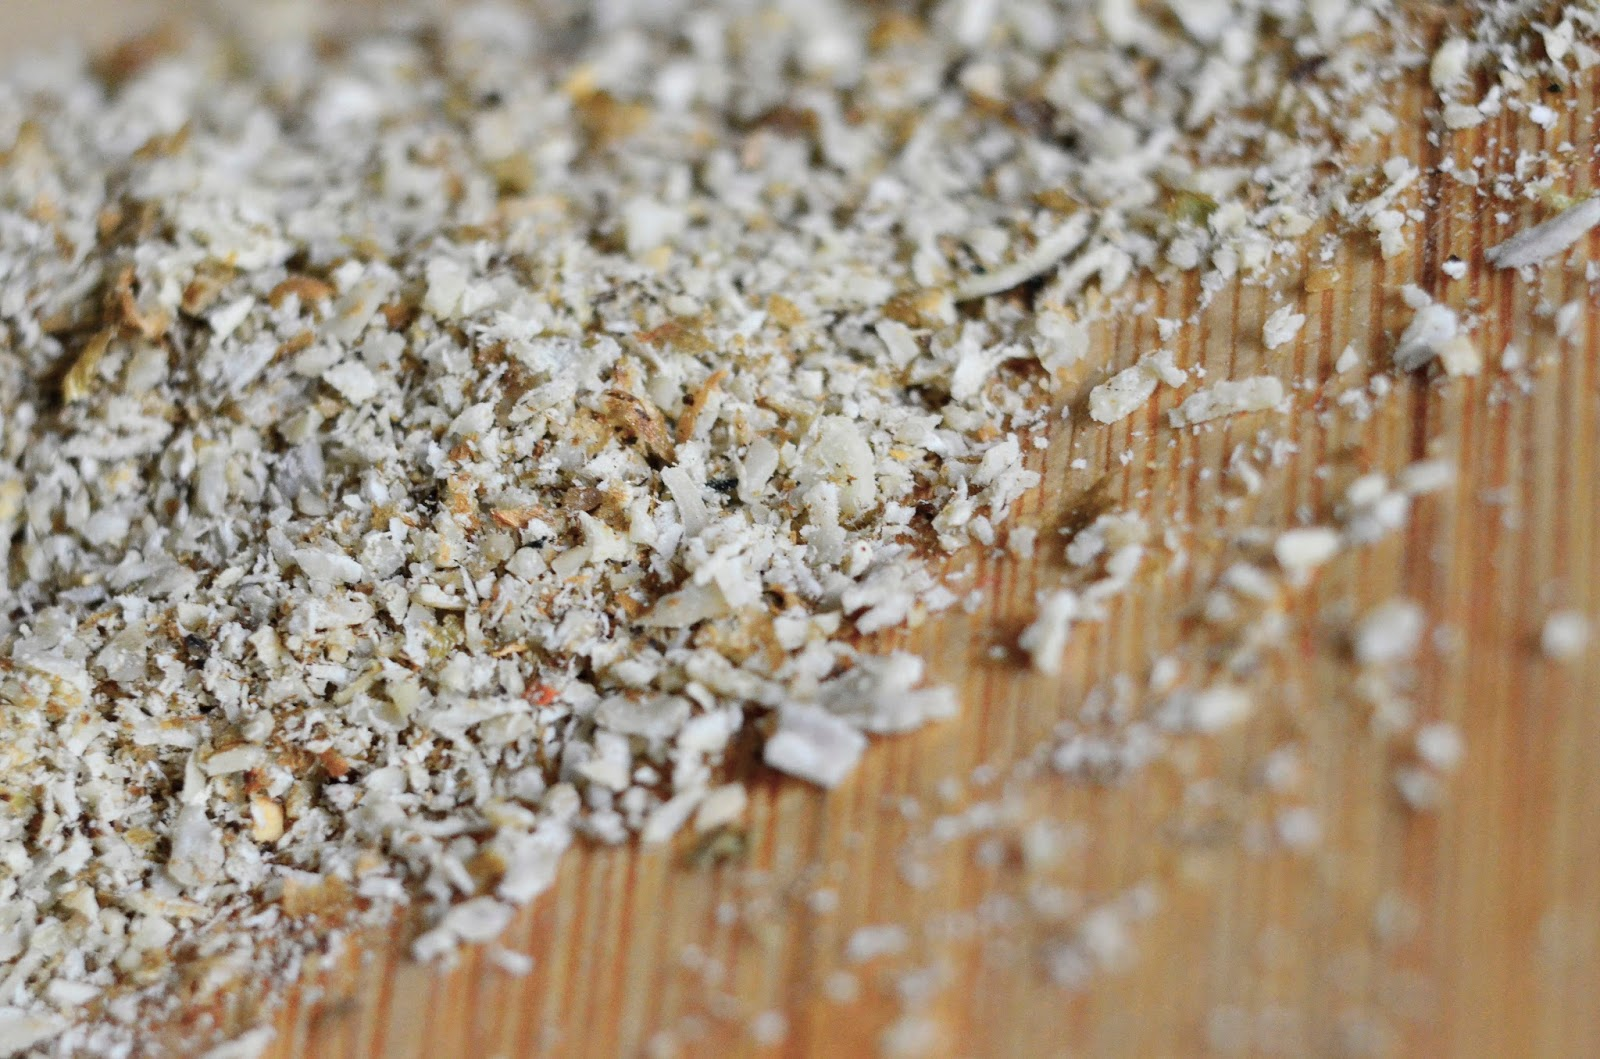 kawa   makro  suplement diety   zieleń   brąz